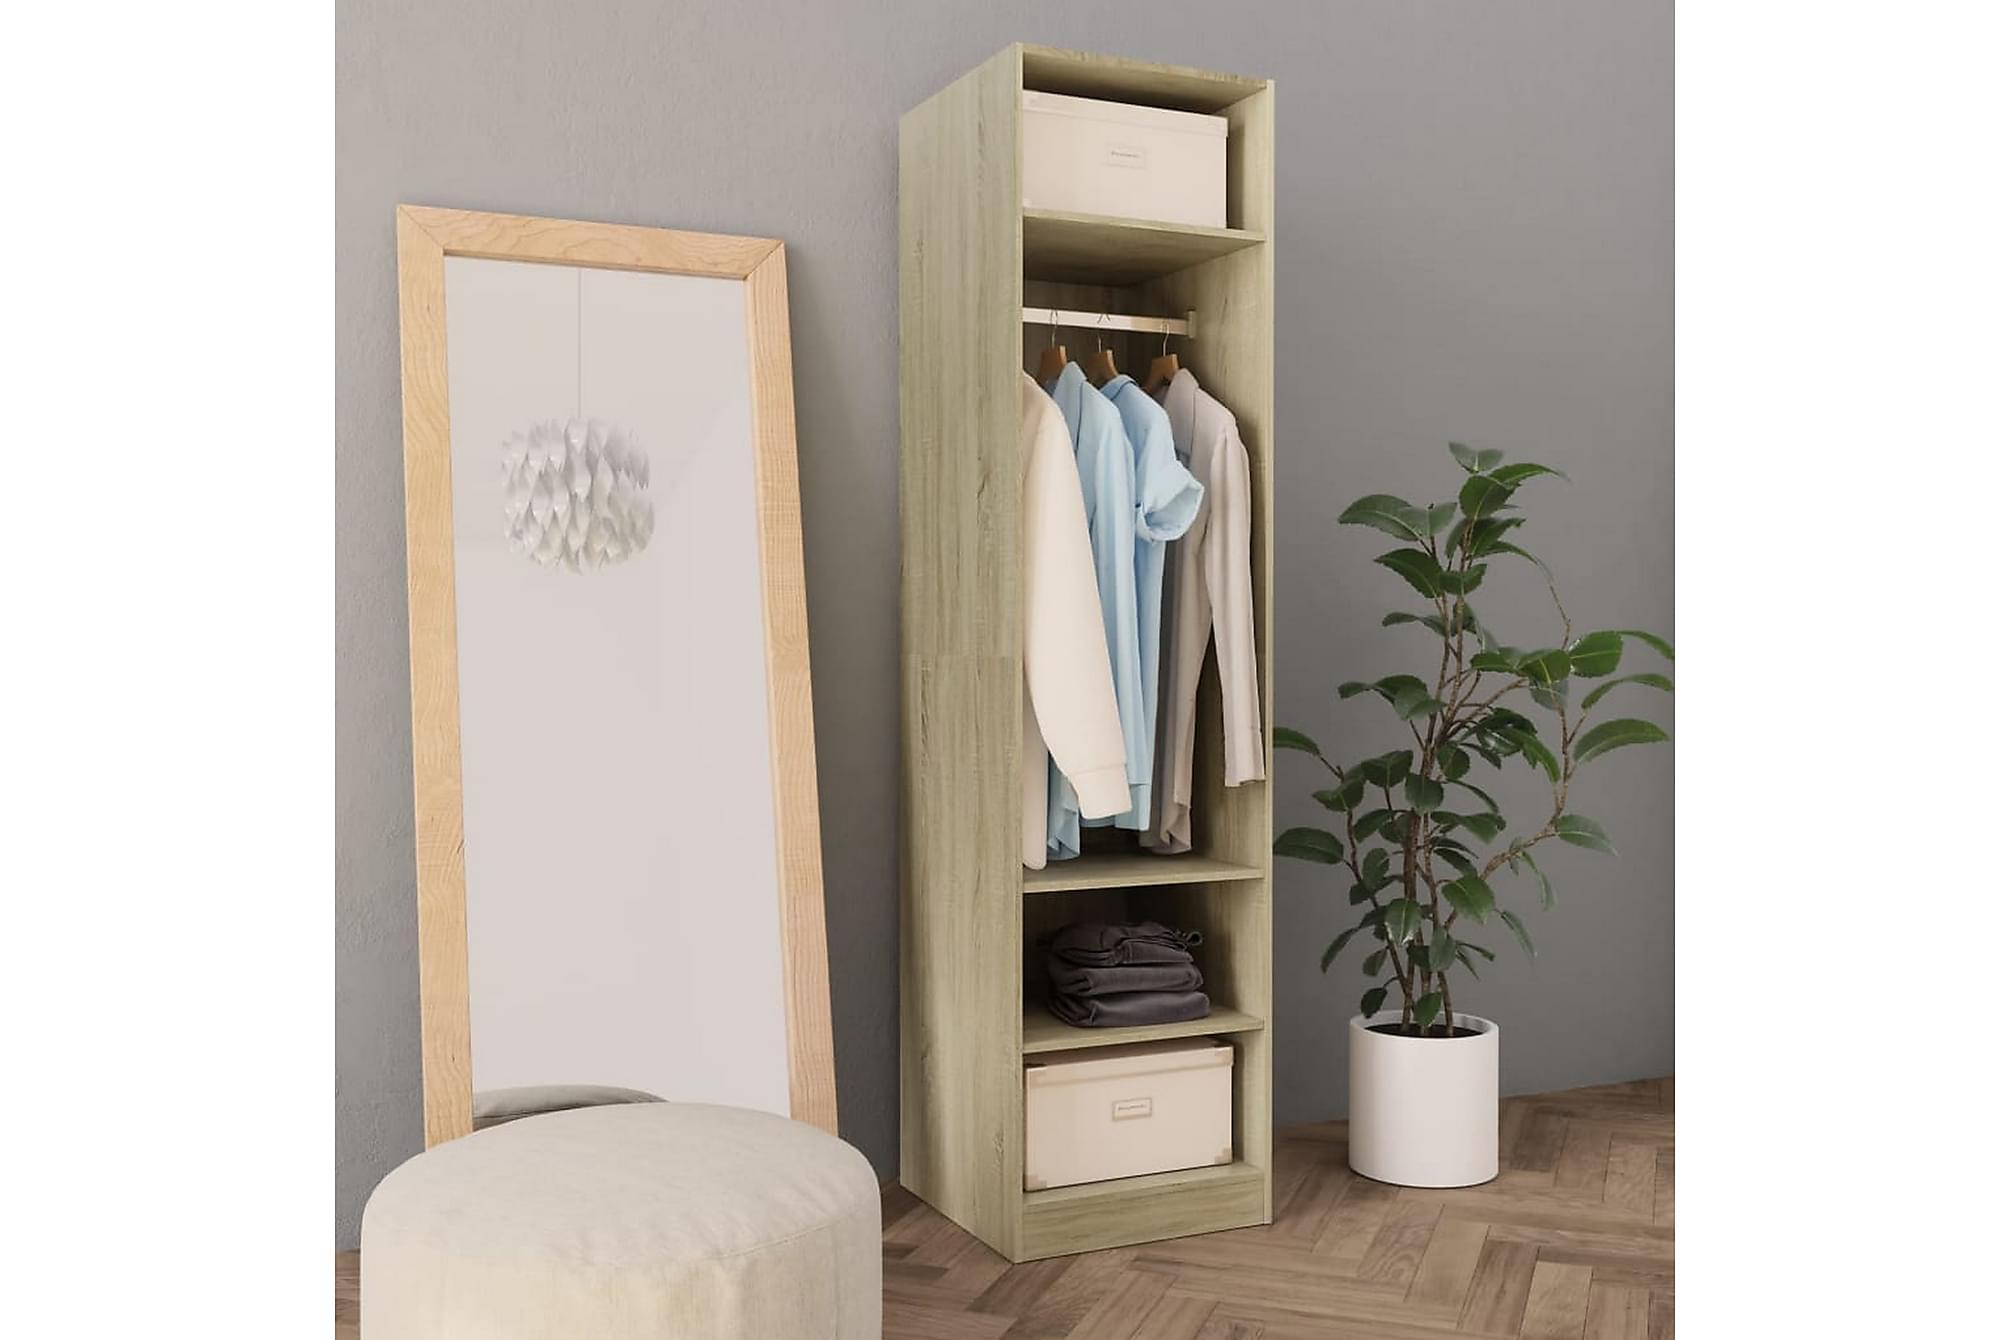 Garderob sonoma-ek 50x50x200 cm spånskiva